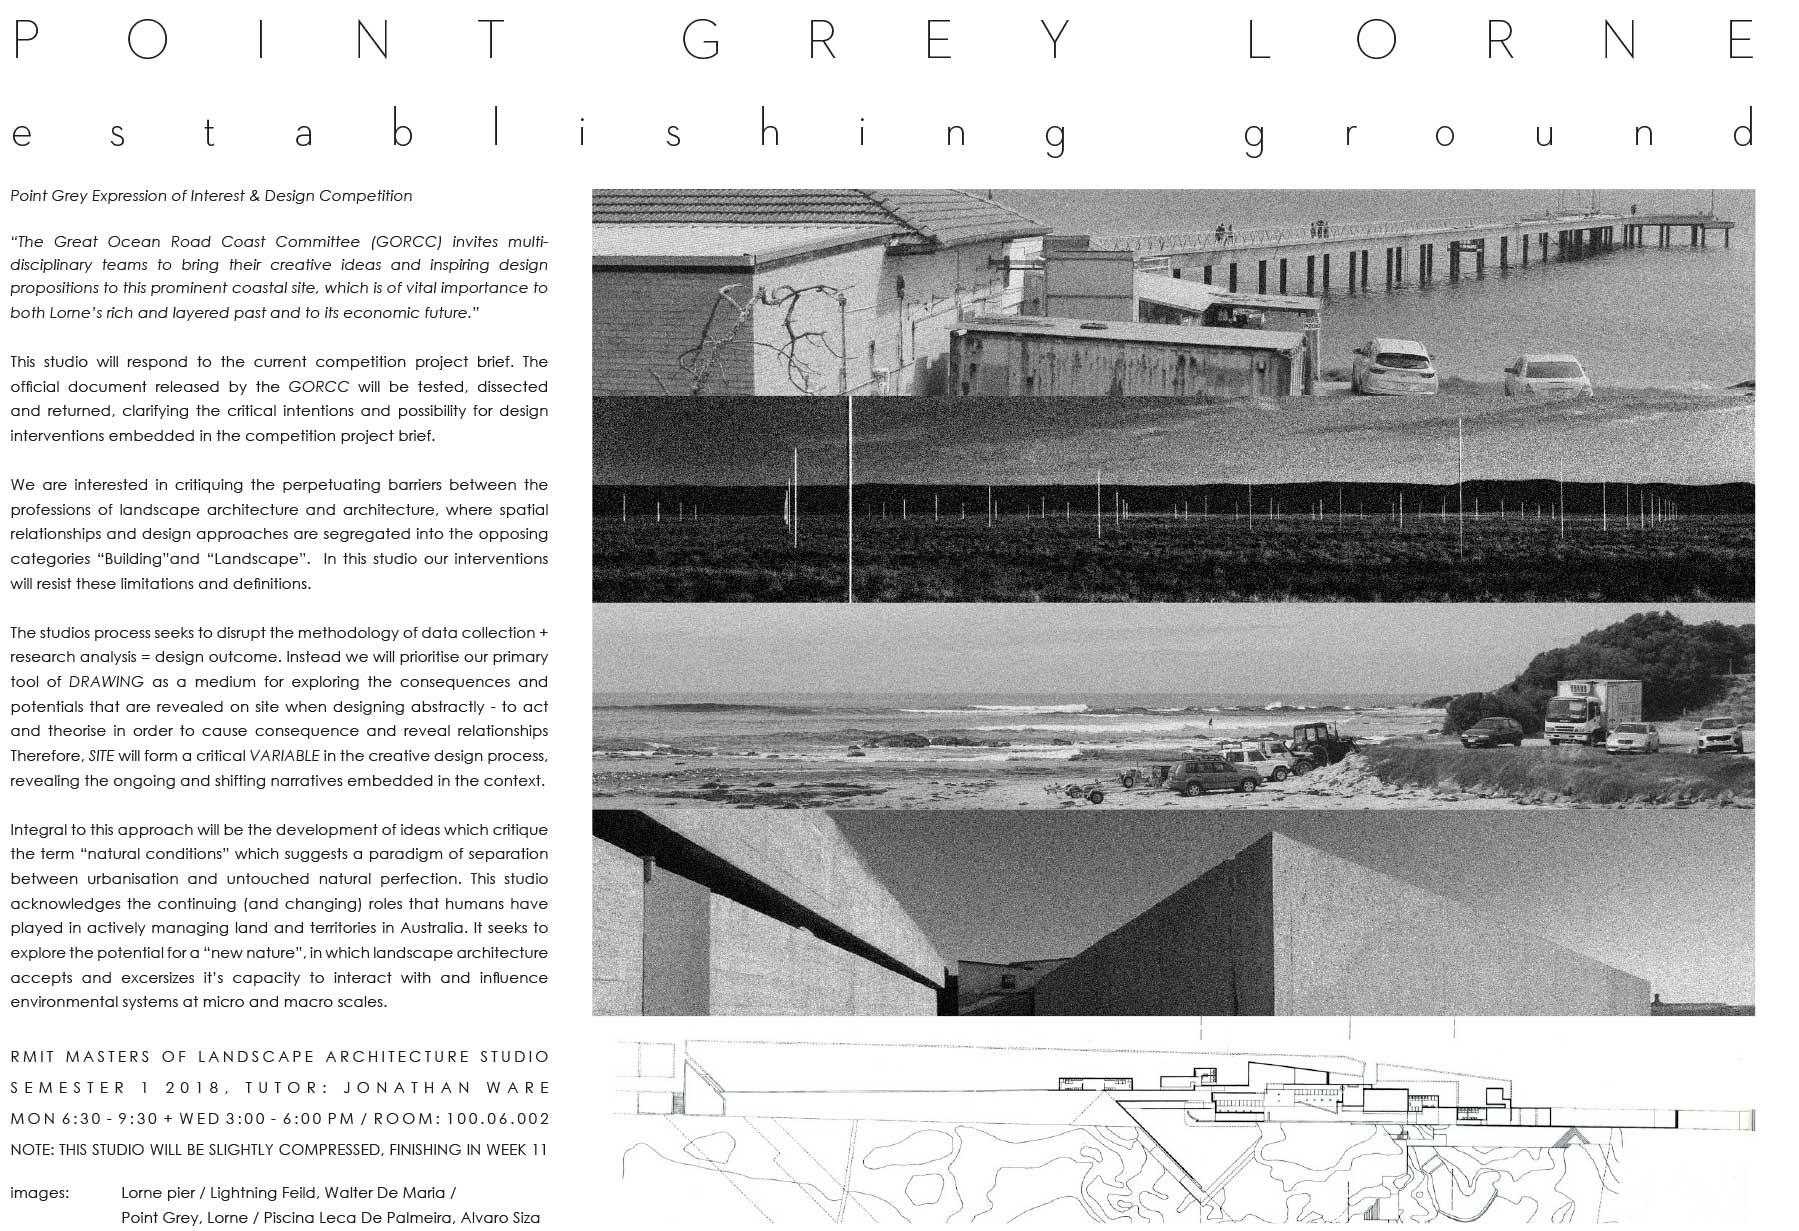 JW_point-grey-lorne_Establishing-Ground.jpg